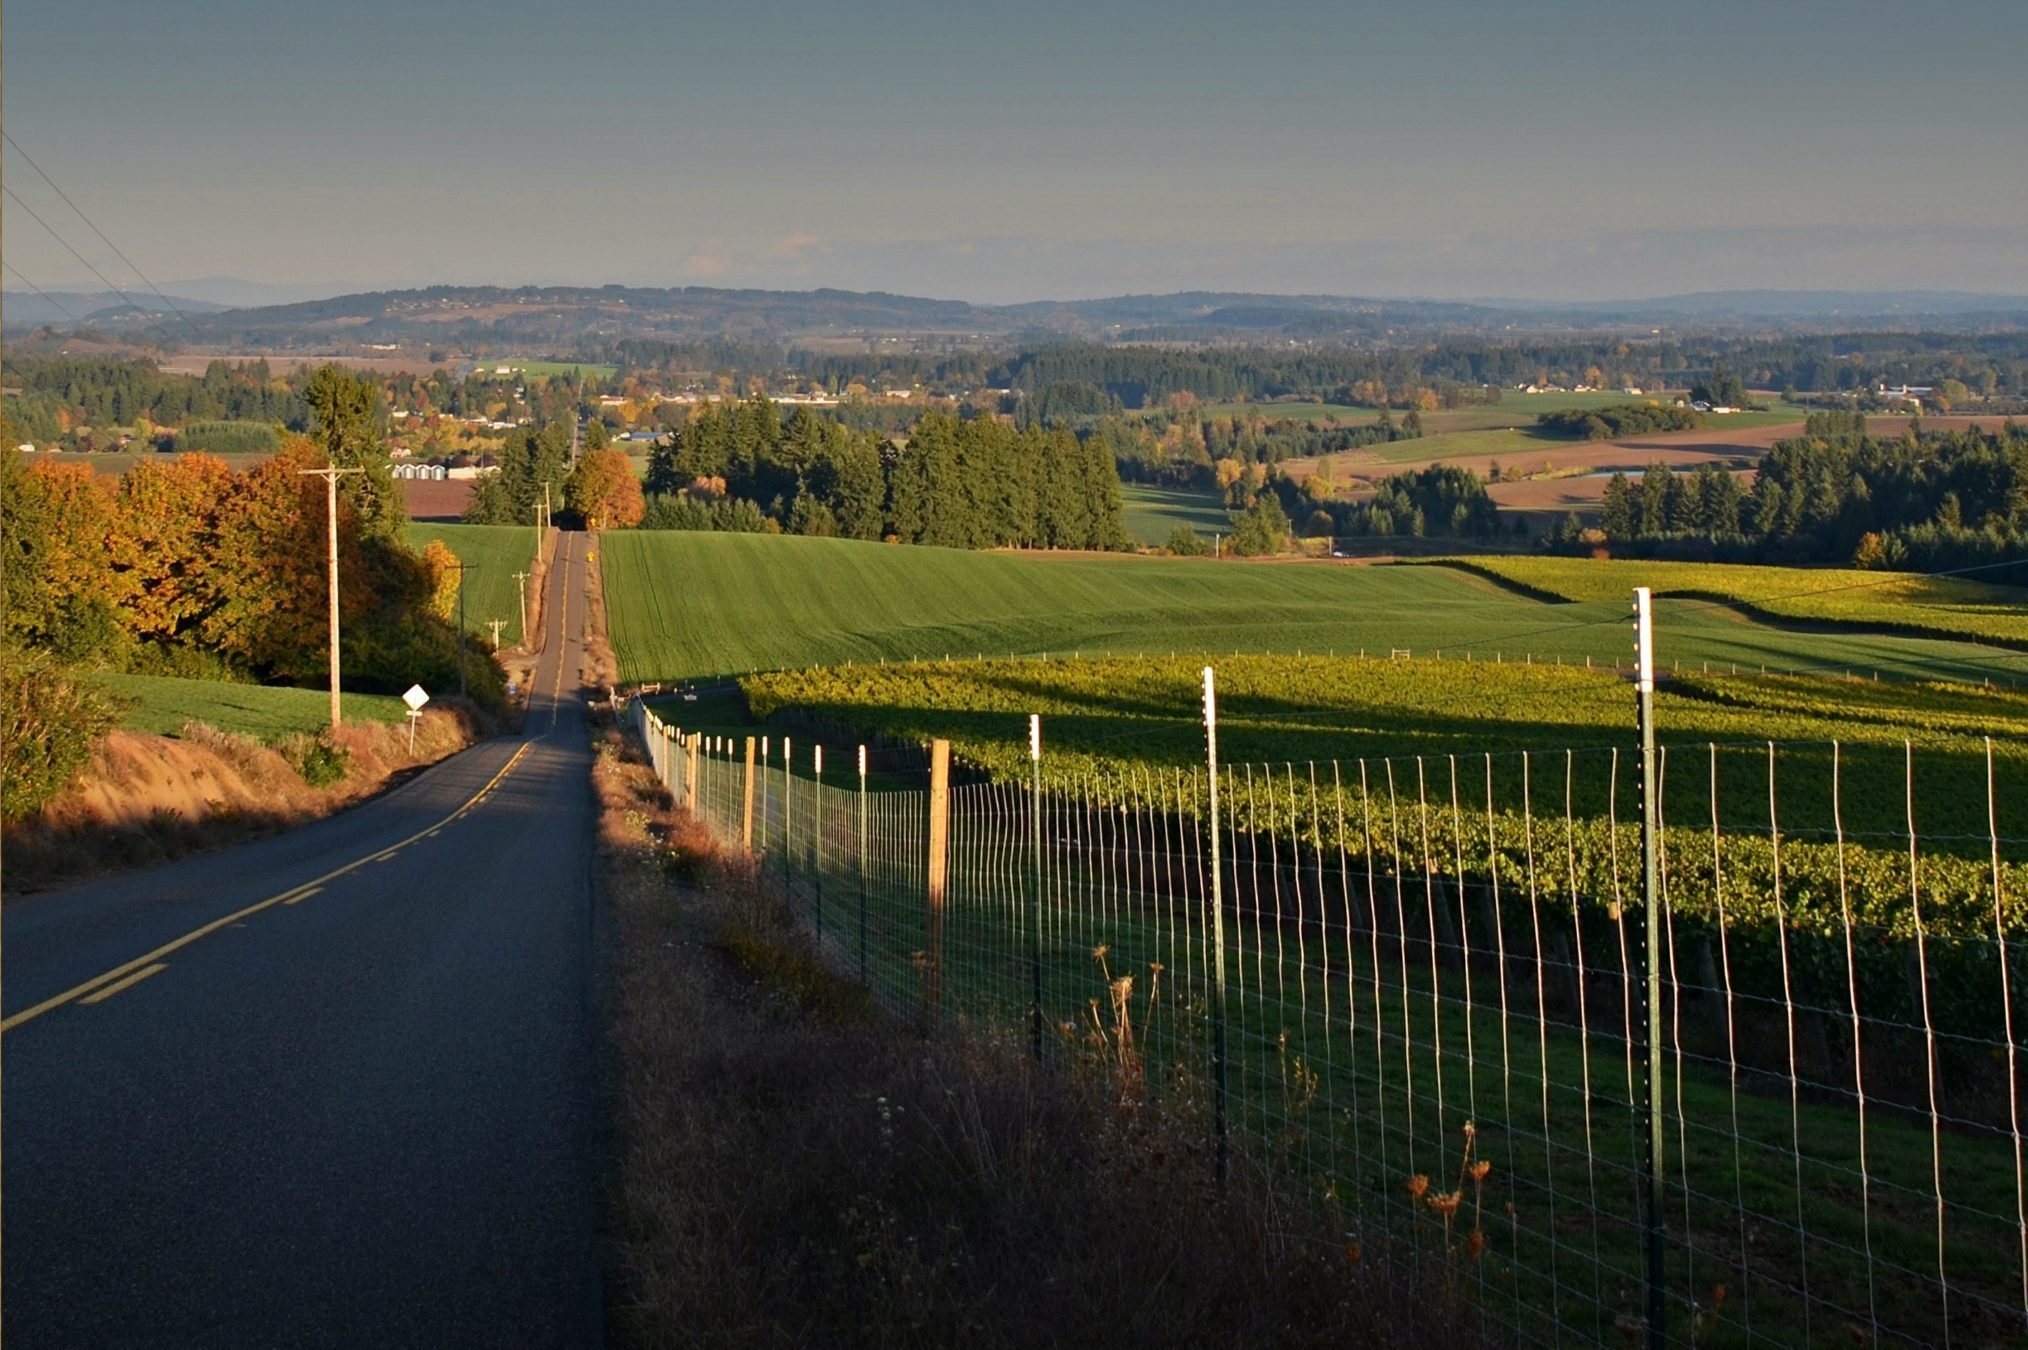 a country road in hillsboro oregon